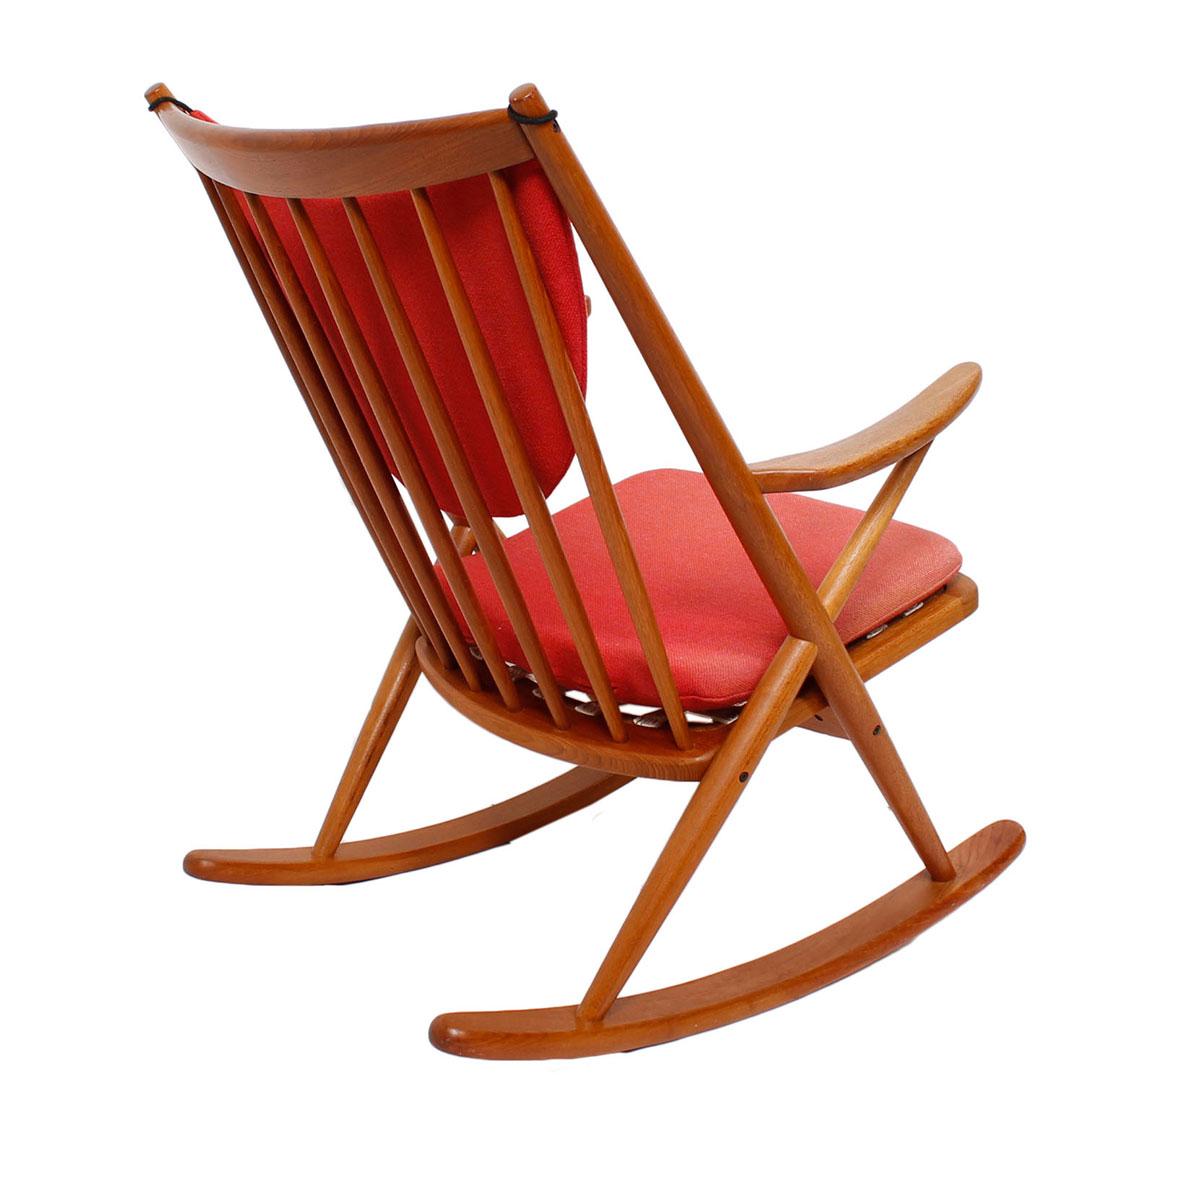 Frank reenskaug rocking chair - Rocking Chair By Frank Reenskaug For Bramin